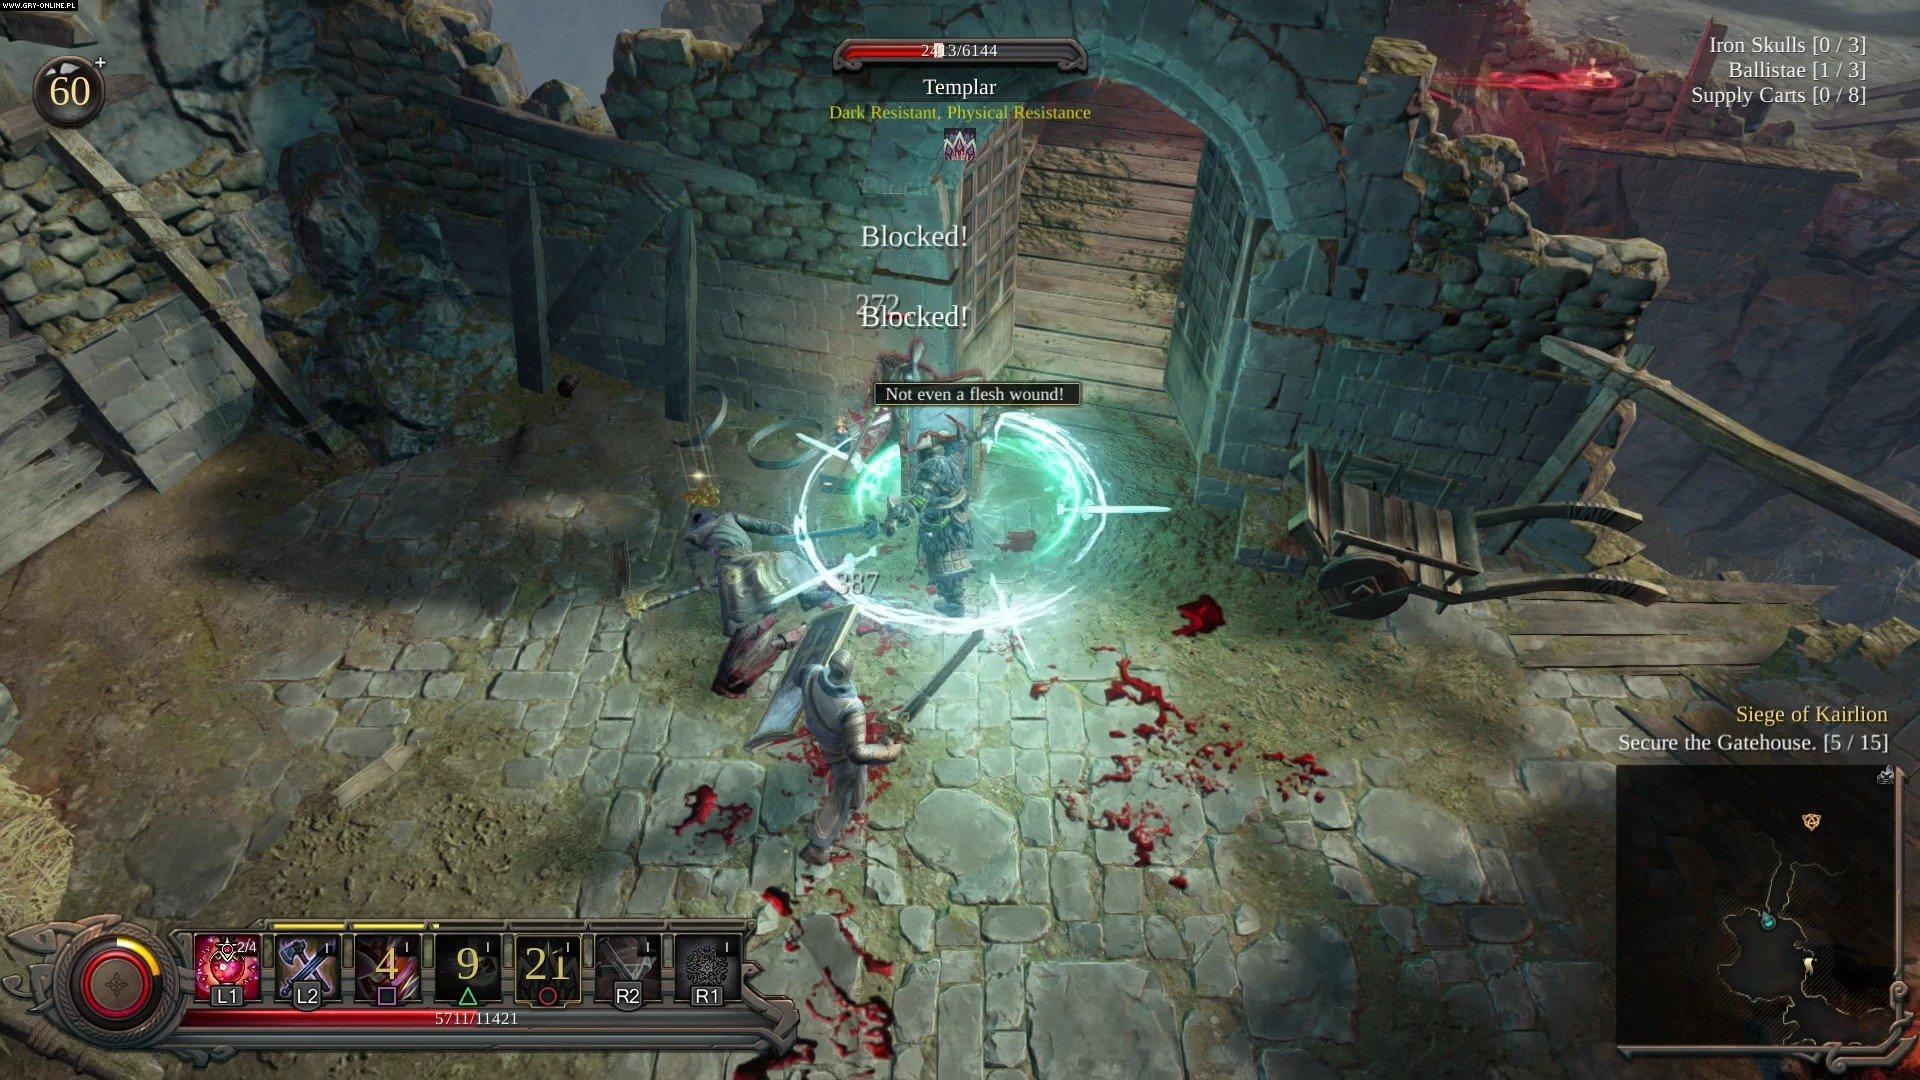 Vikings: Wolves of Midgard PC, PS4, XONE Games Image 1/18, Games Farm, Kalypso Media